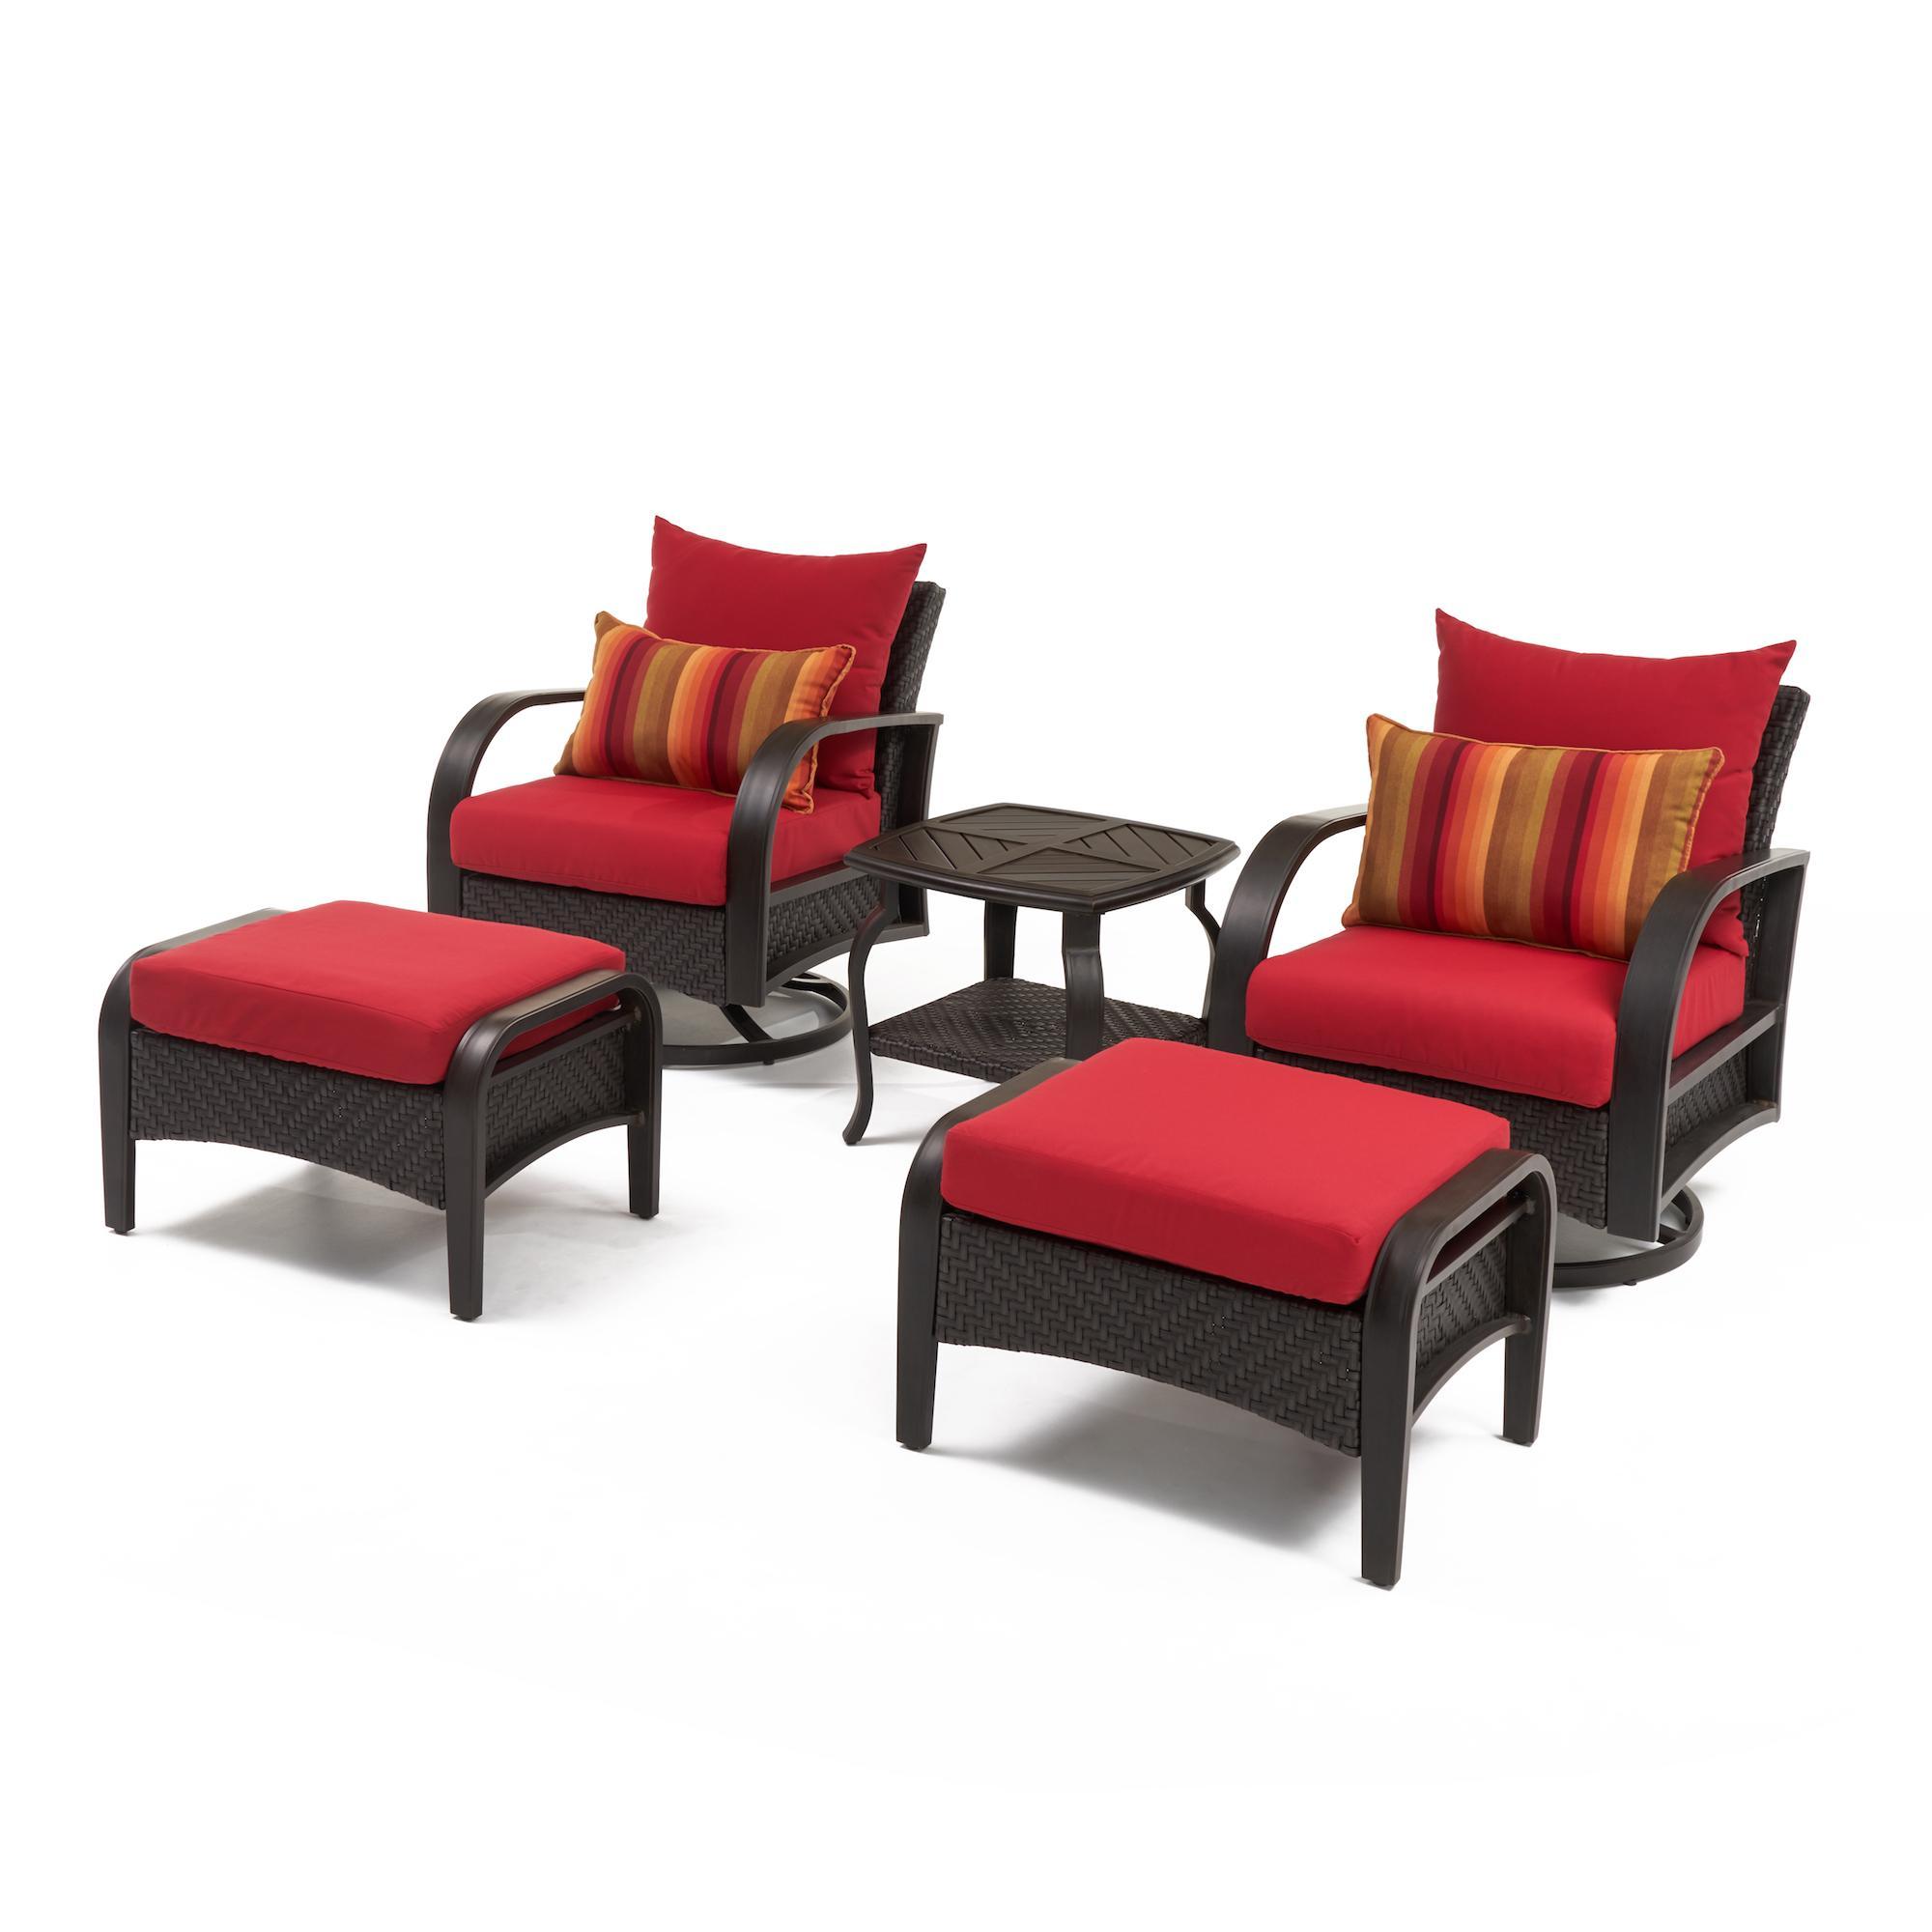 Awe Inspiring Barcelo 5Pc Motion Club Chair Ottoman Set Spa Blue Cjindustries Chair Design For Home Cjindustriesco